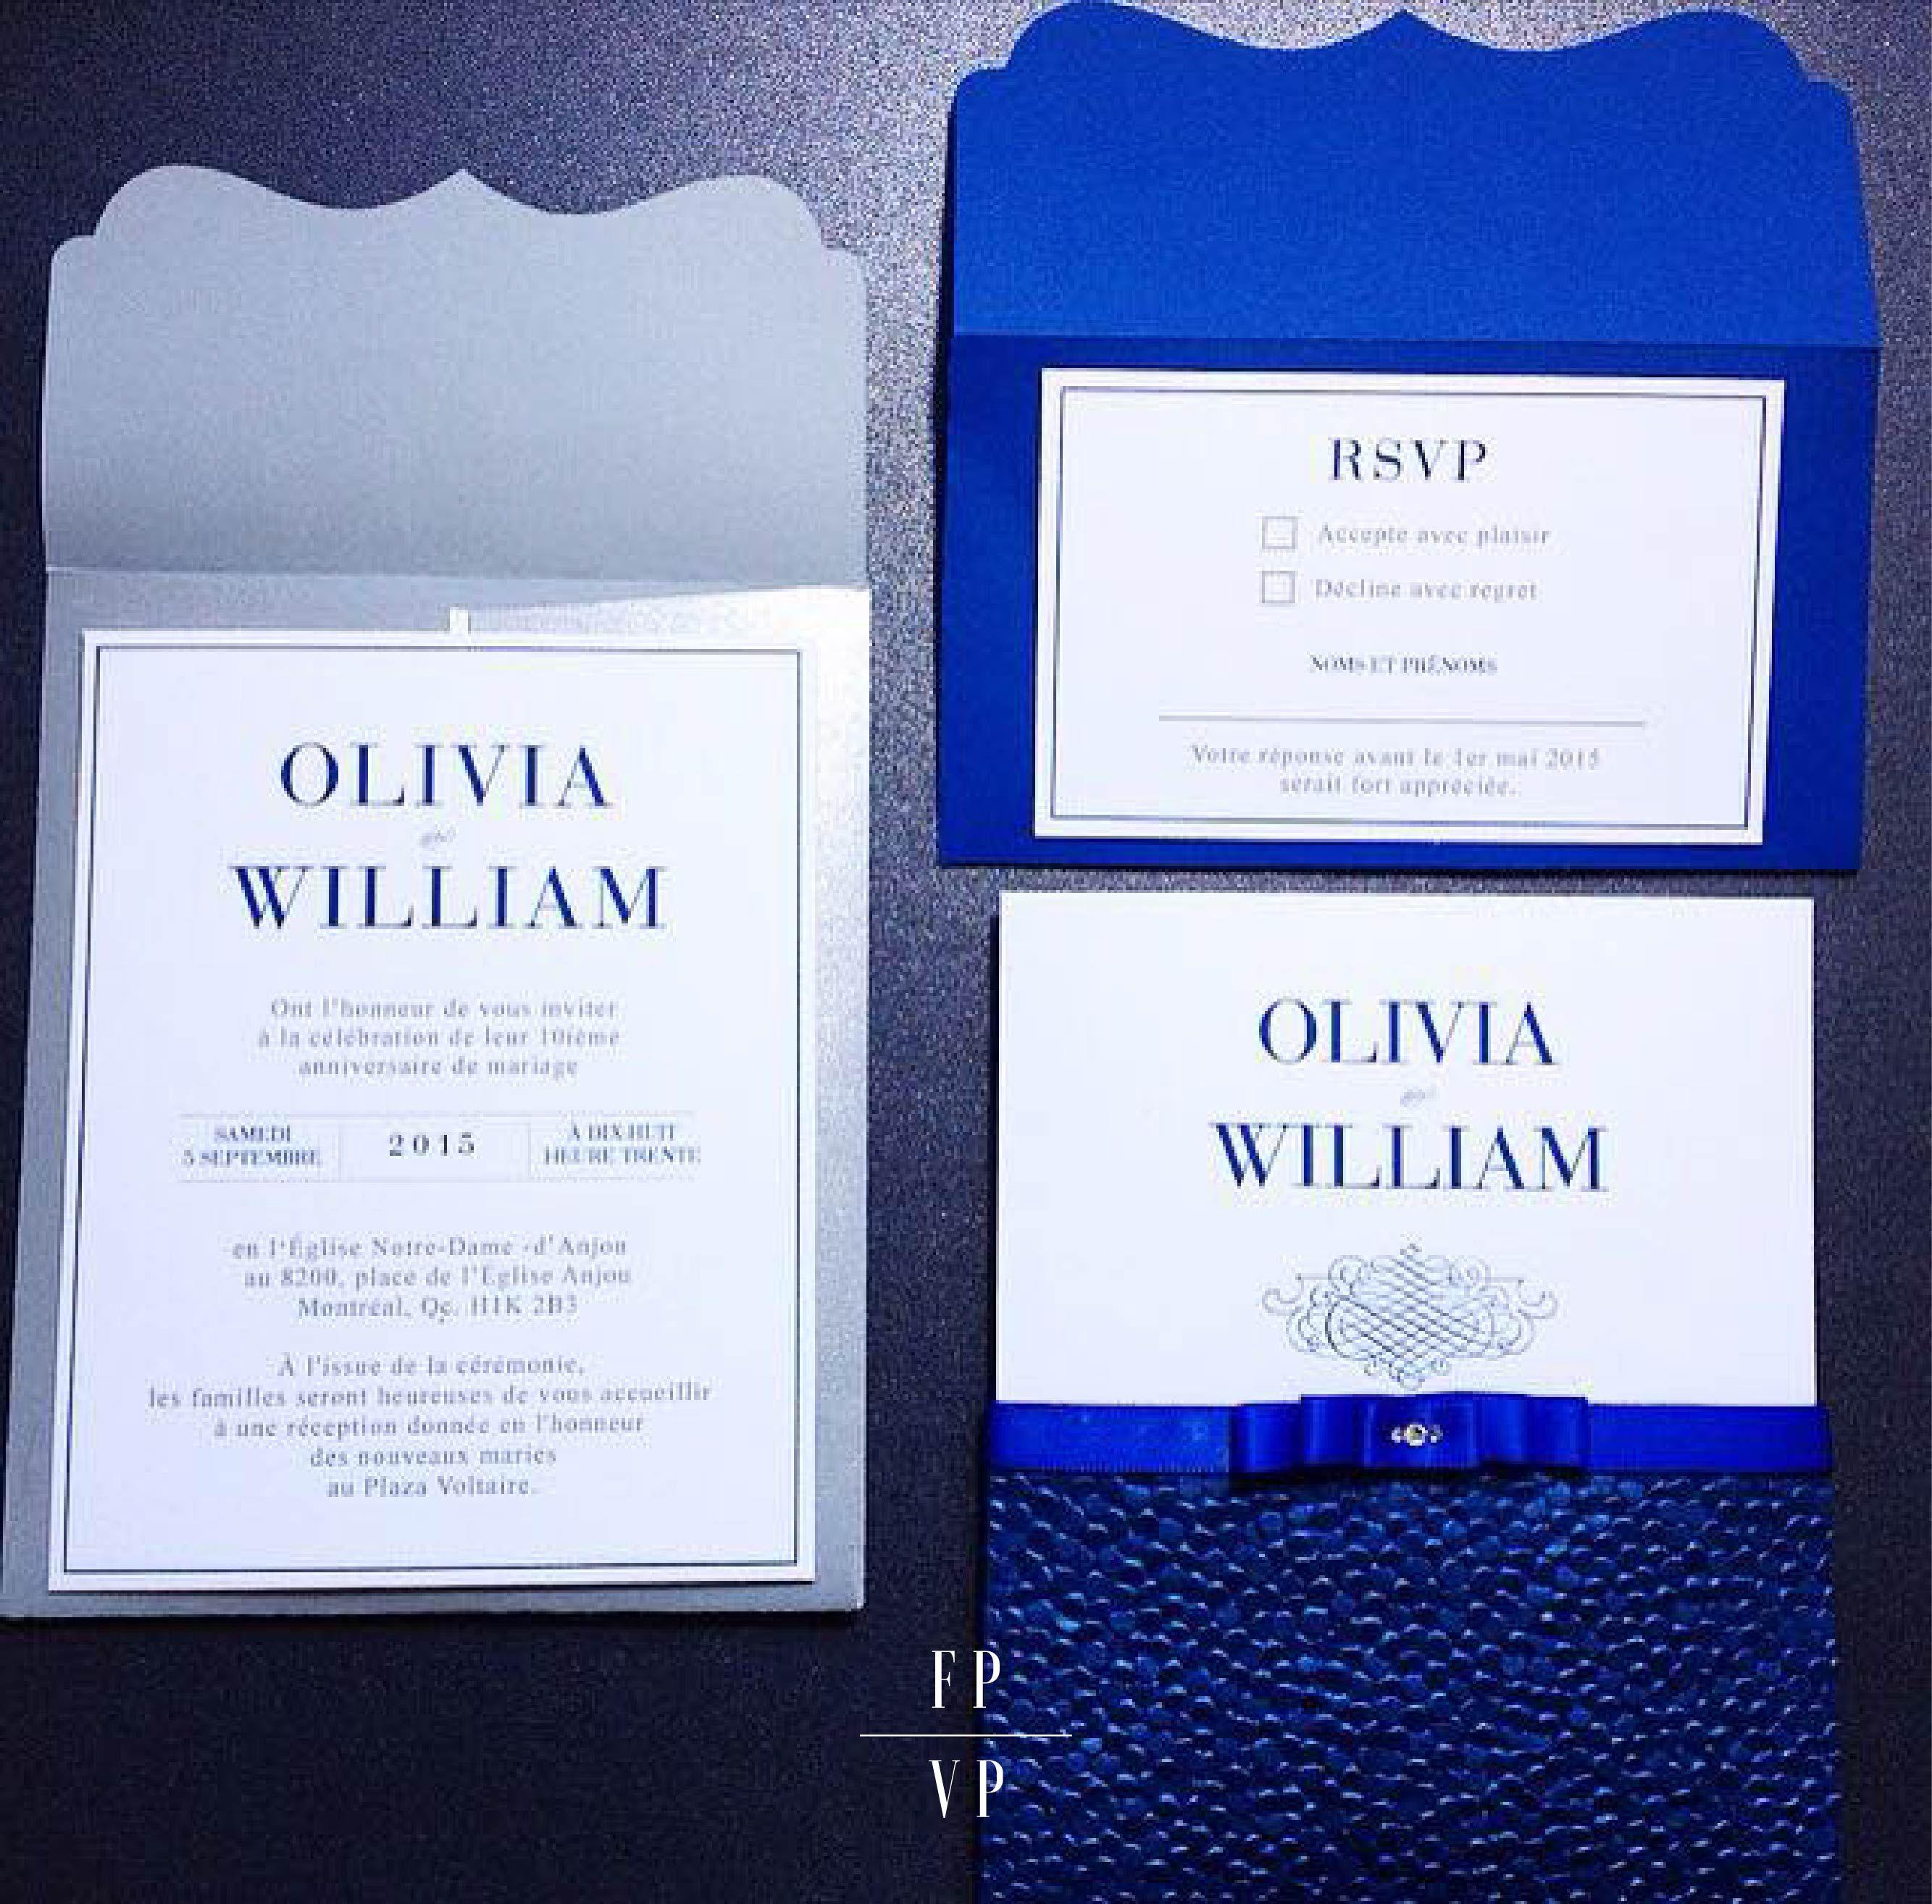 Montreal Wedding Invitations: Elegant Royal Blue Wedding Invitation, Invitation Card